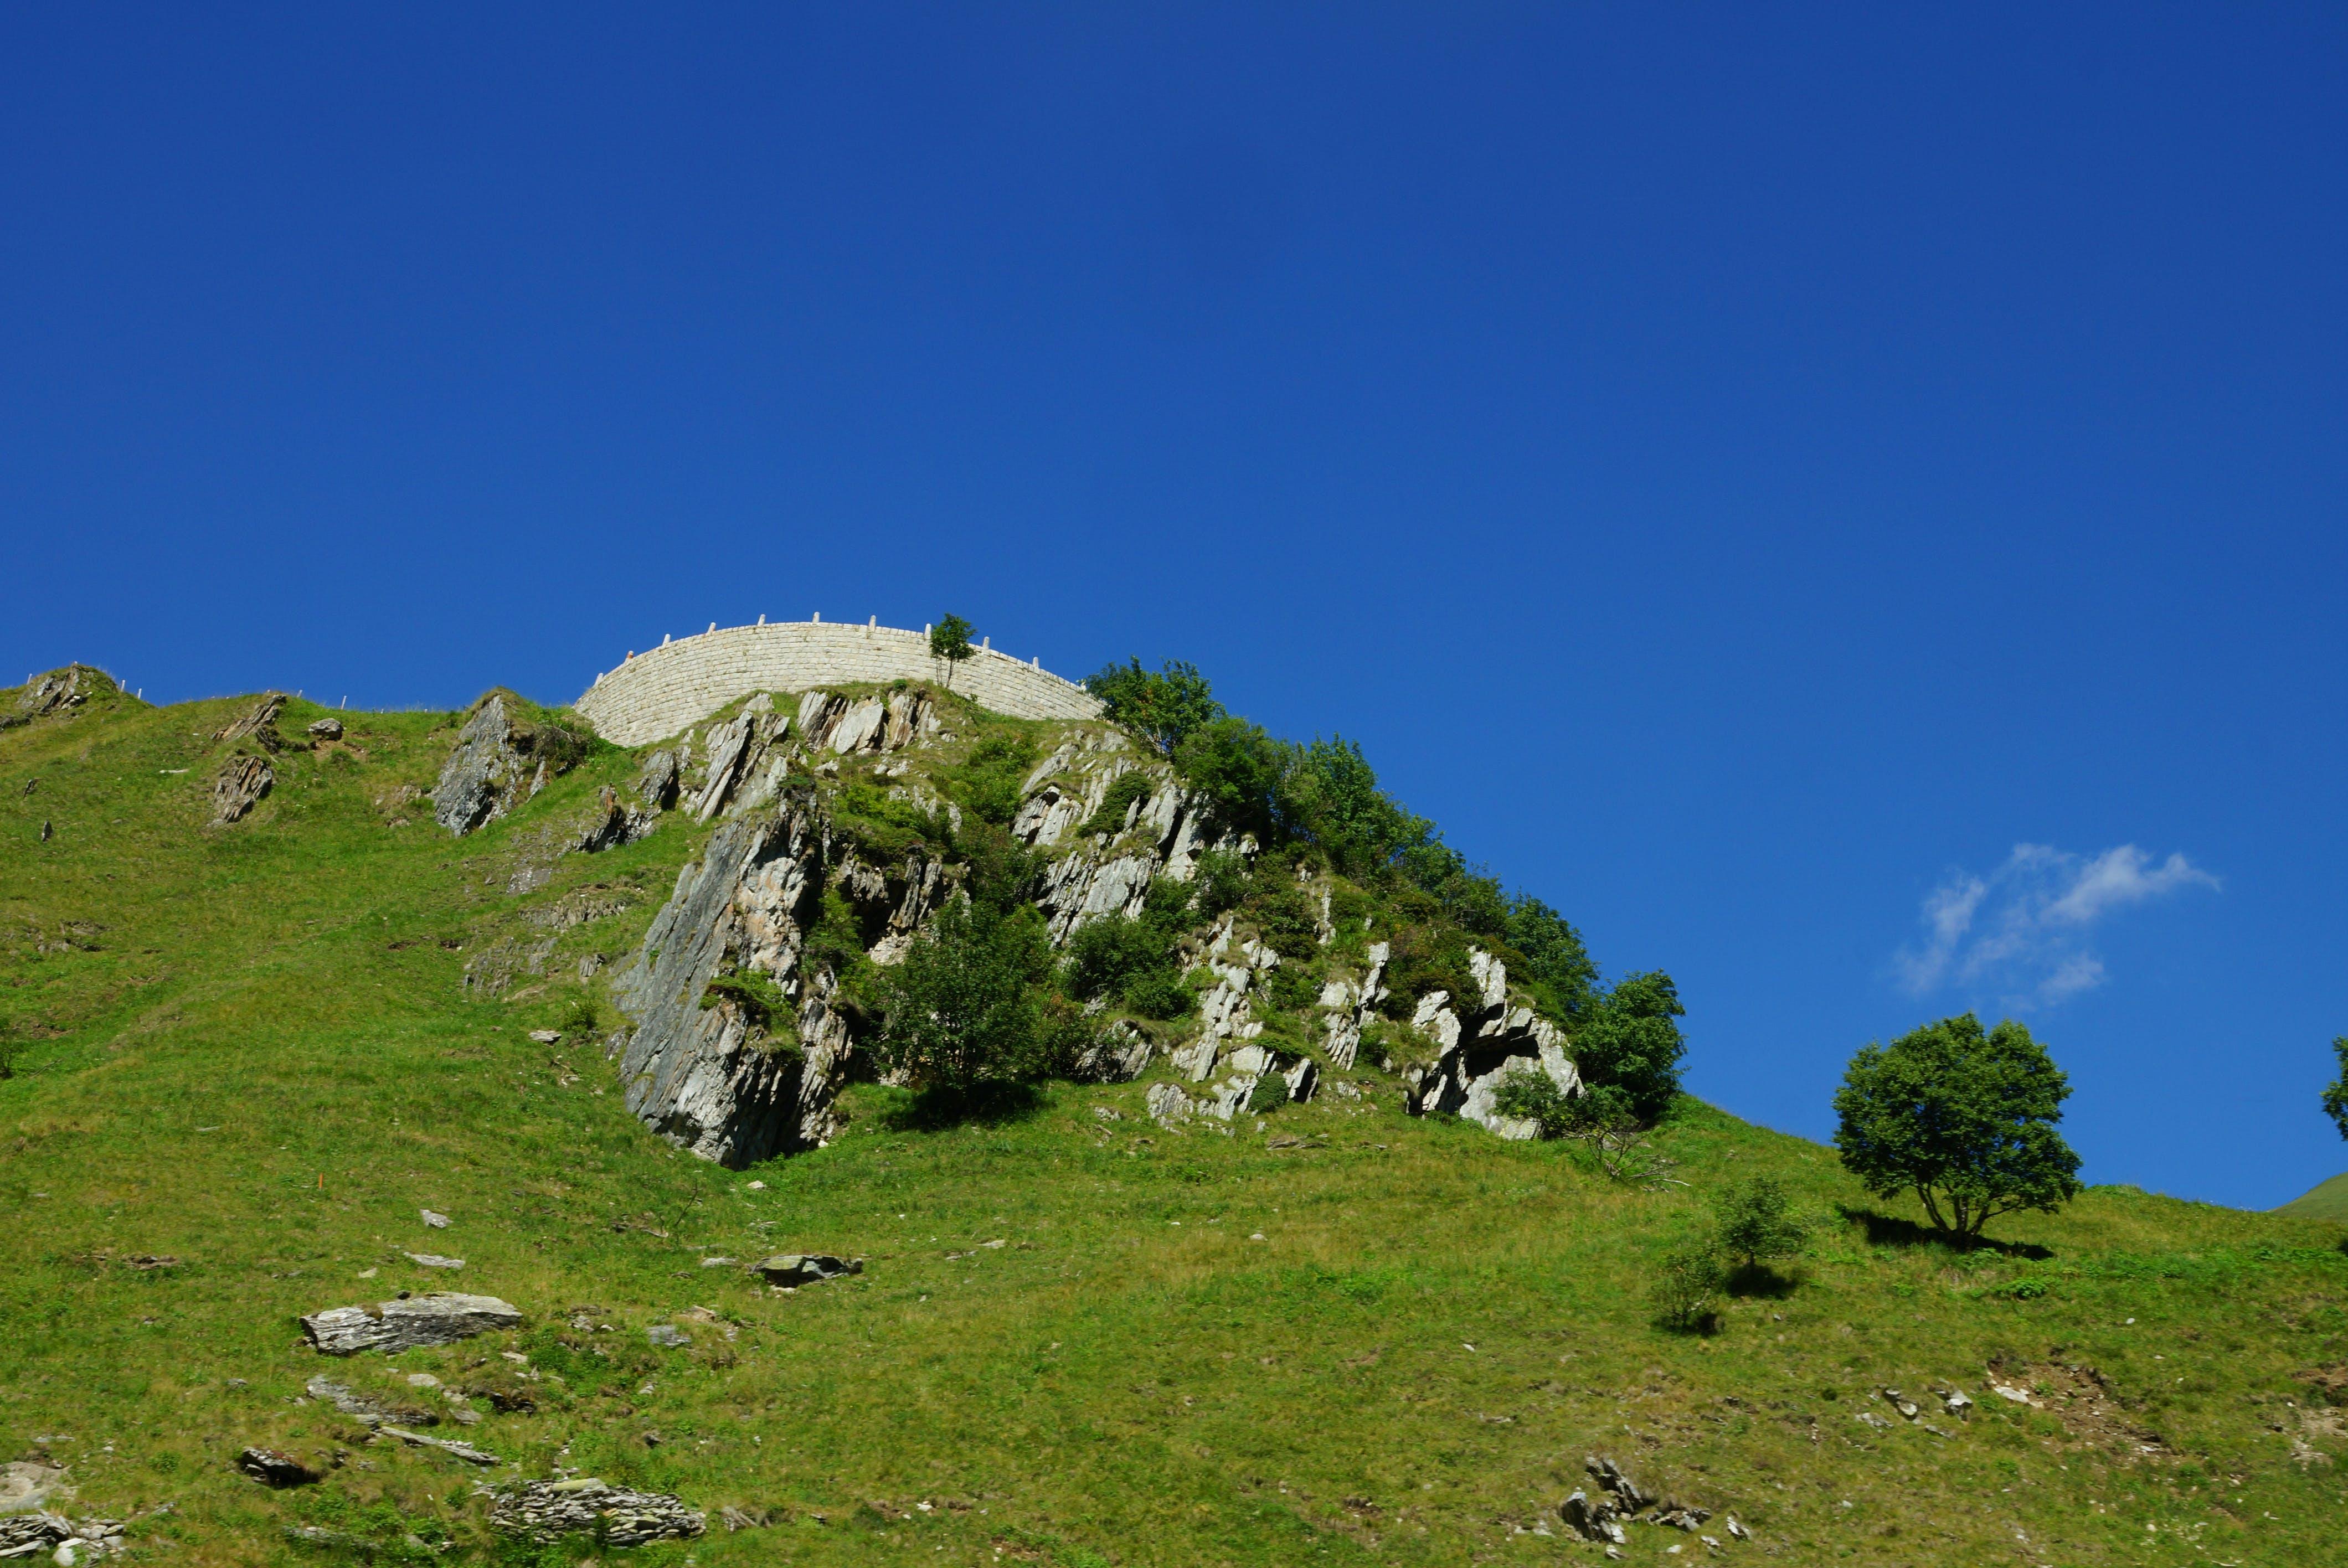 Free stock photo of blue sky, meadow, tree